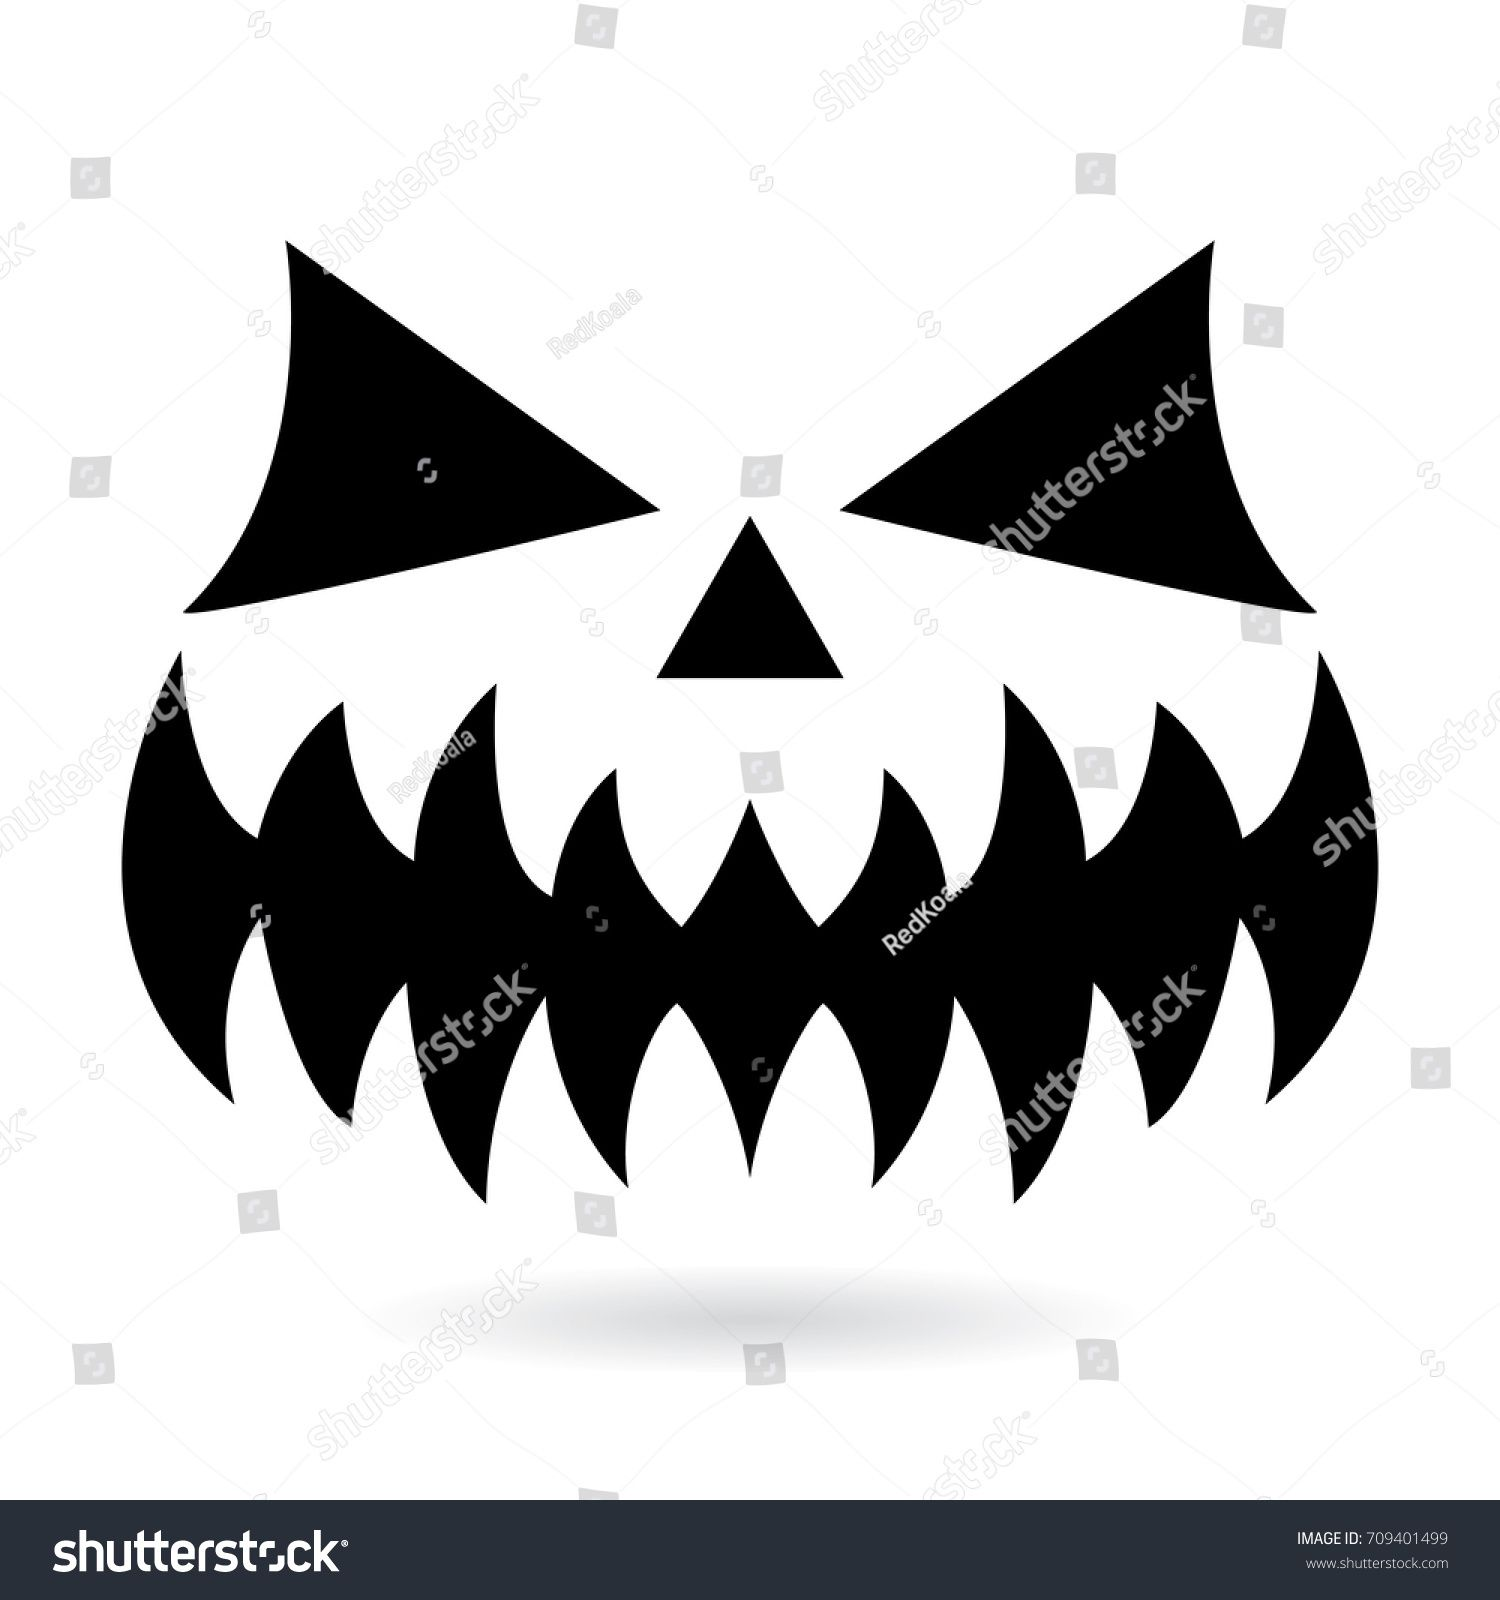 Related image Scary halloween pumpkins, Halloween